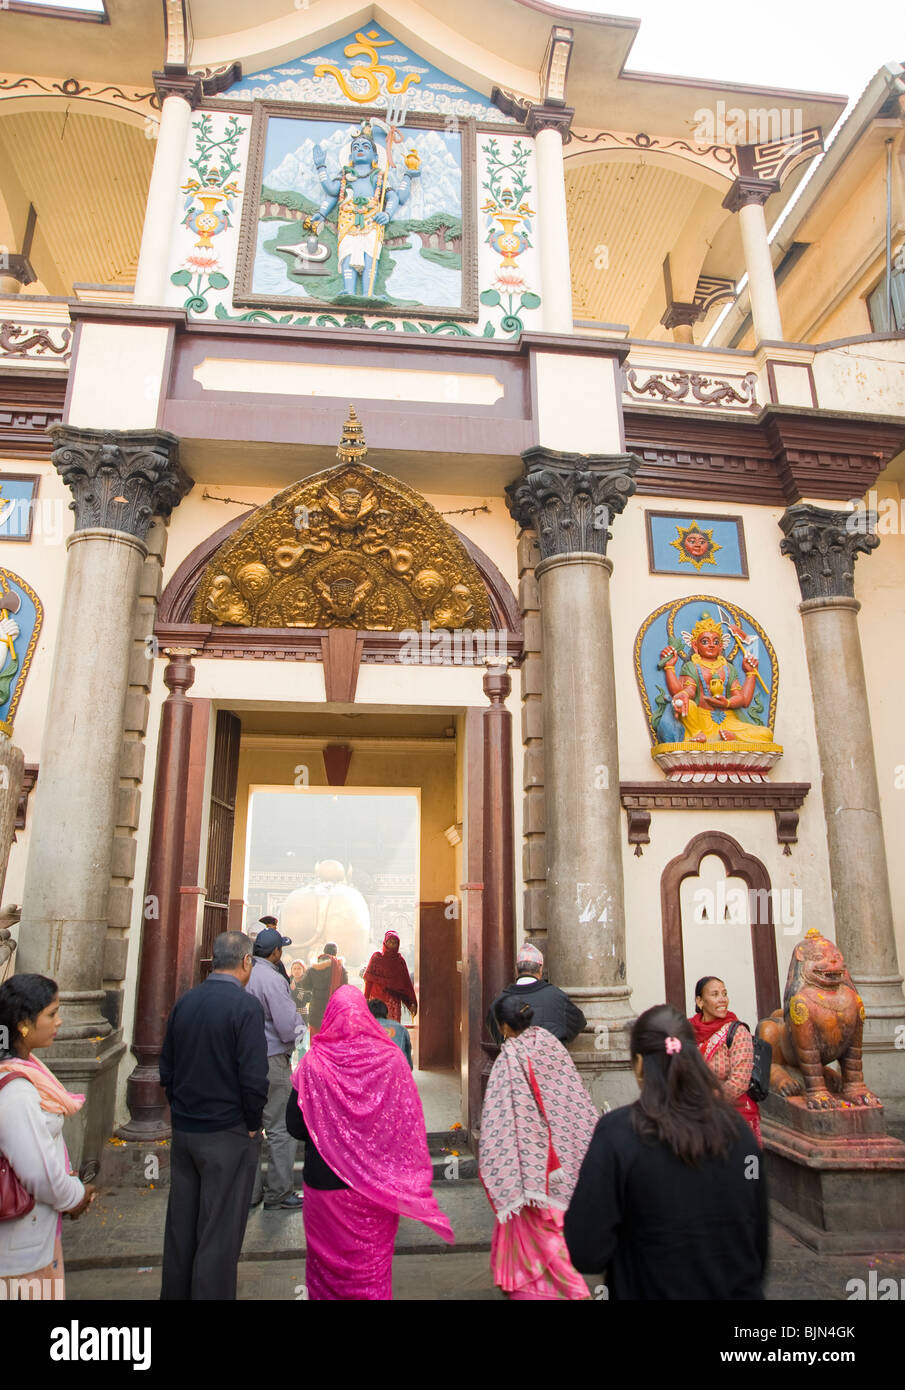 Entrance to Pashupatinath Hindu Temple in Kathmandu, Nepal - Stock Image